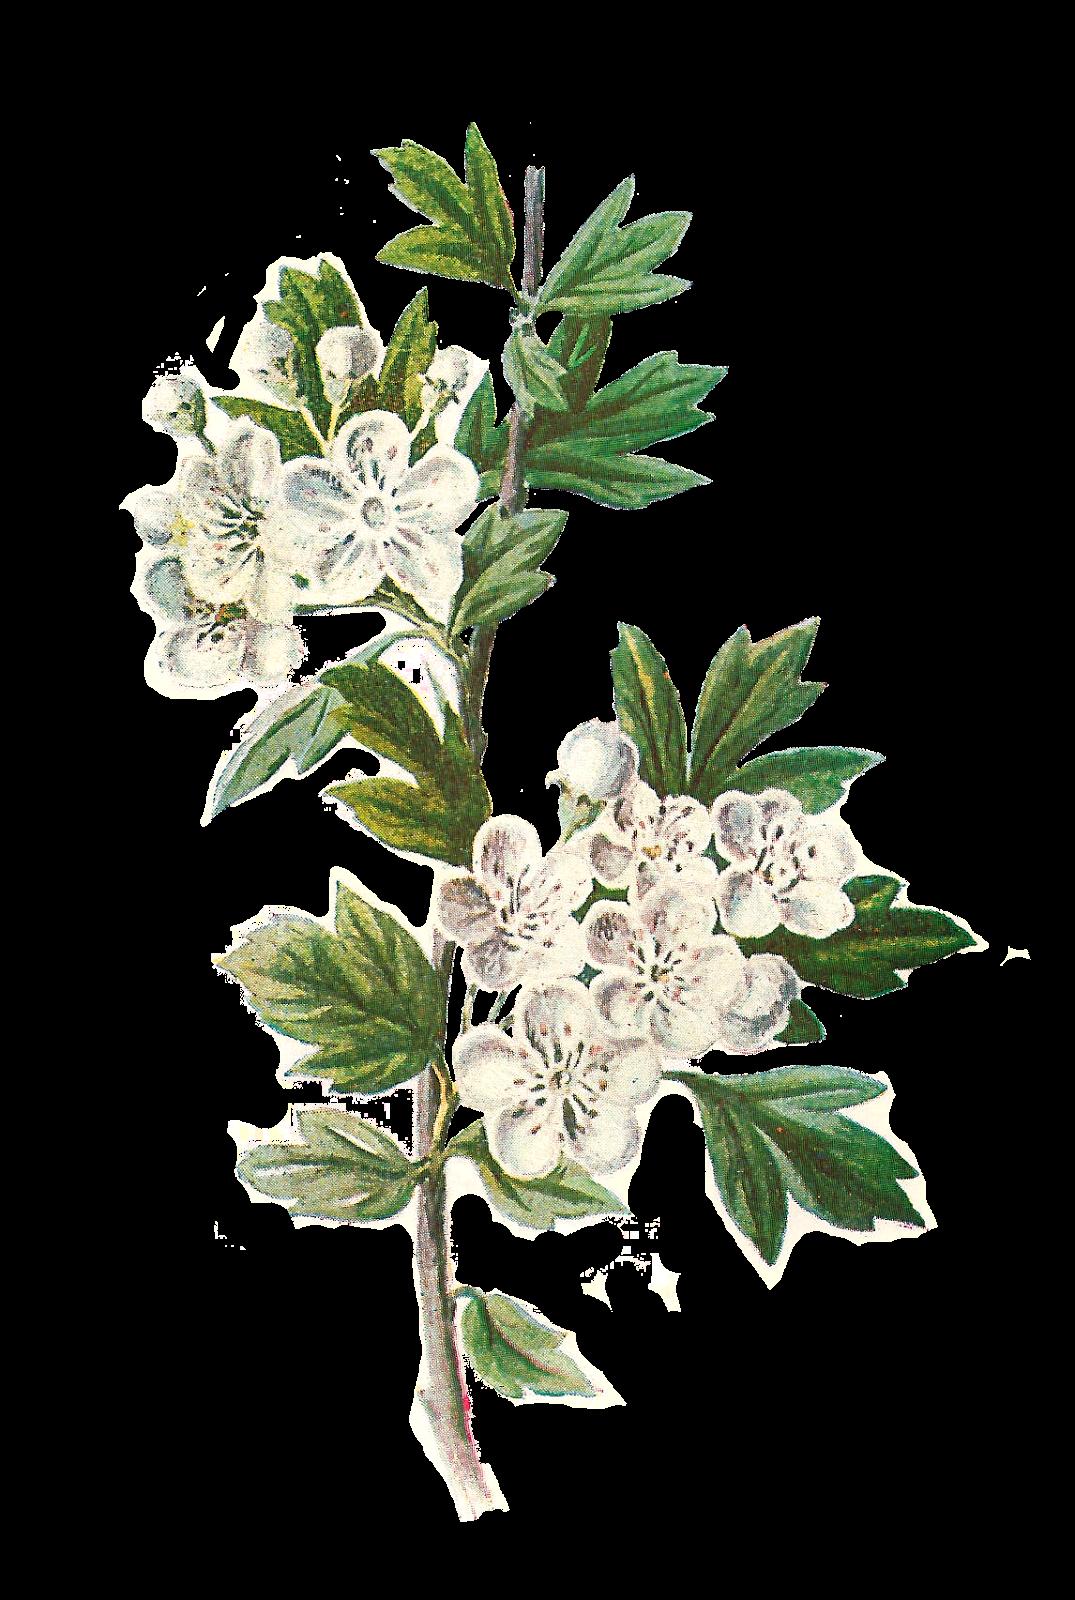 Antique Images: Digital Wildflower Hawthorn Clip Art Botanical Illustration Flower